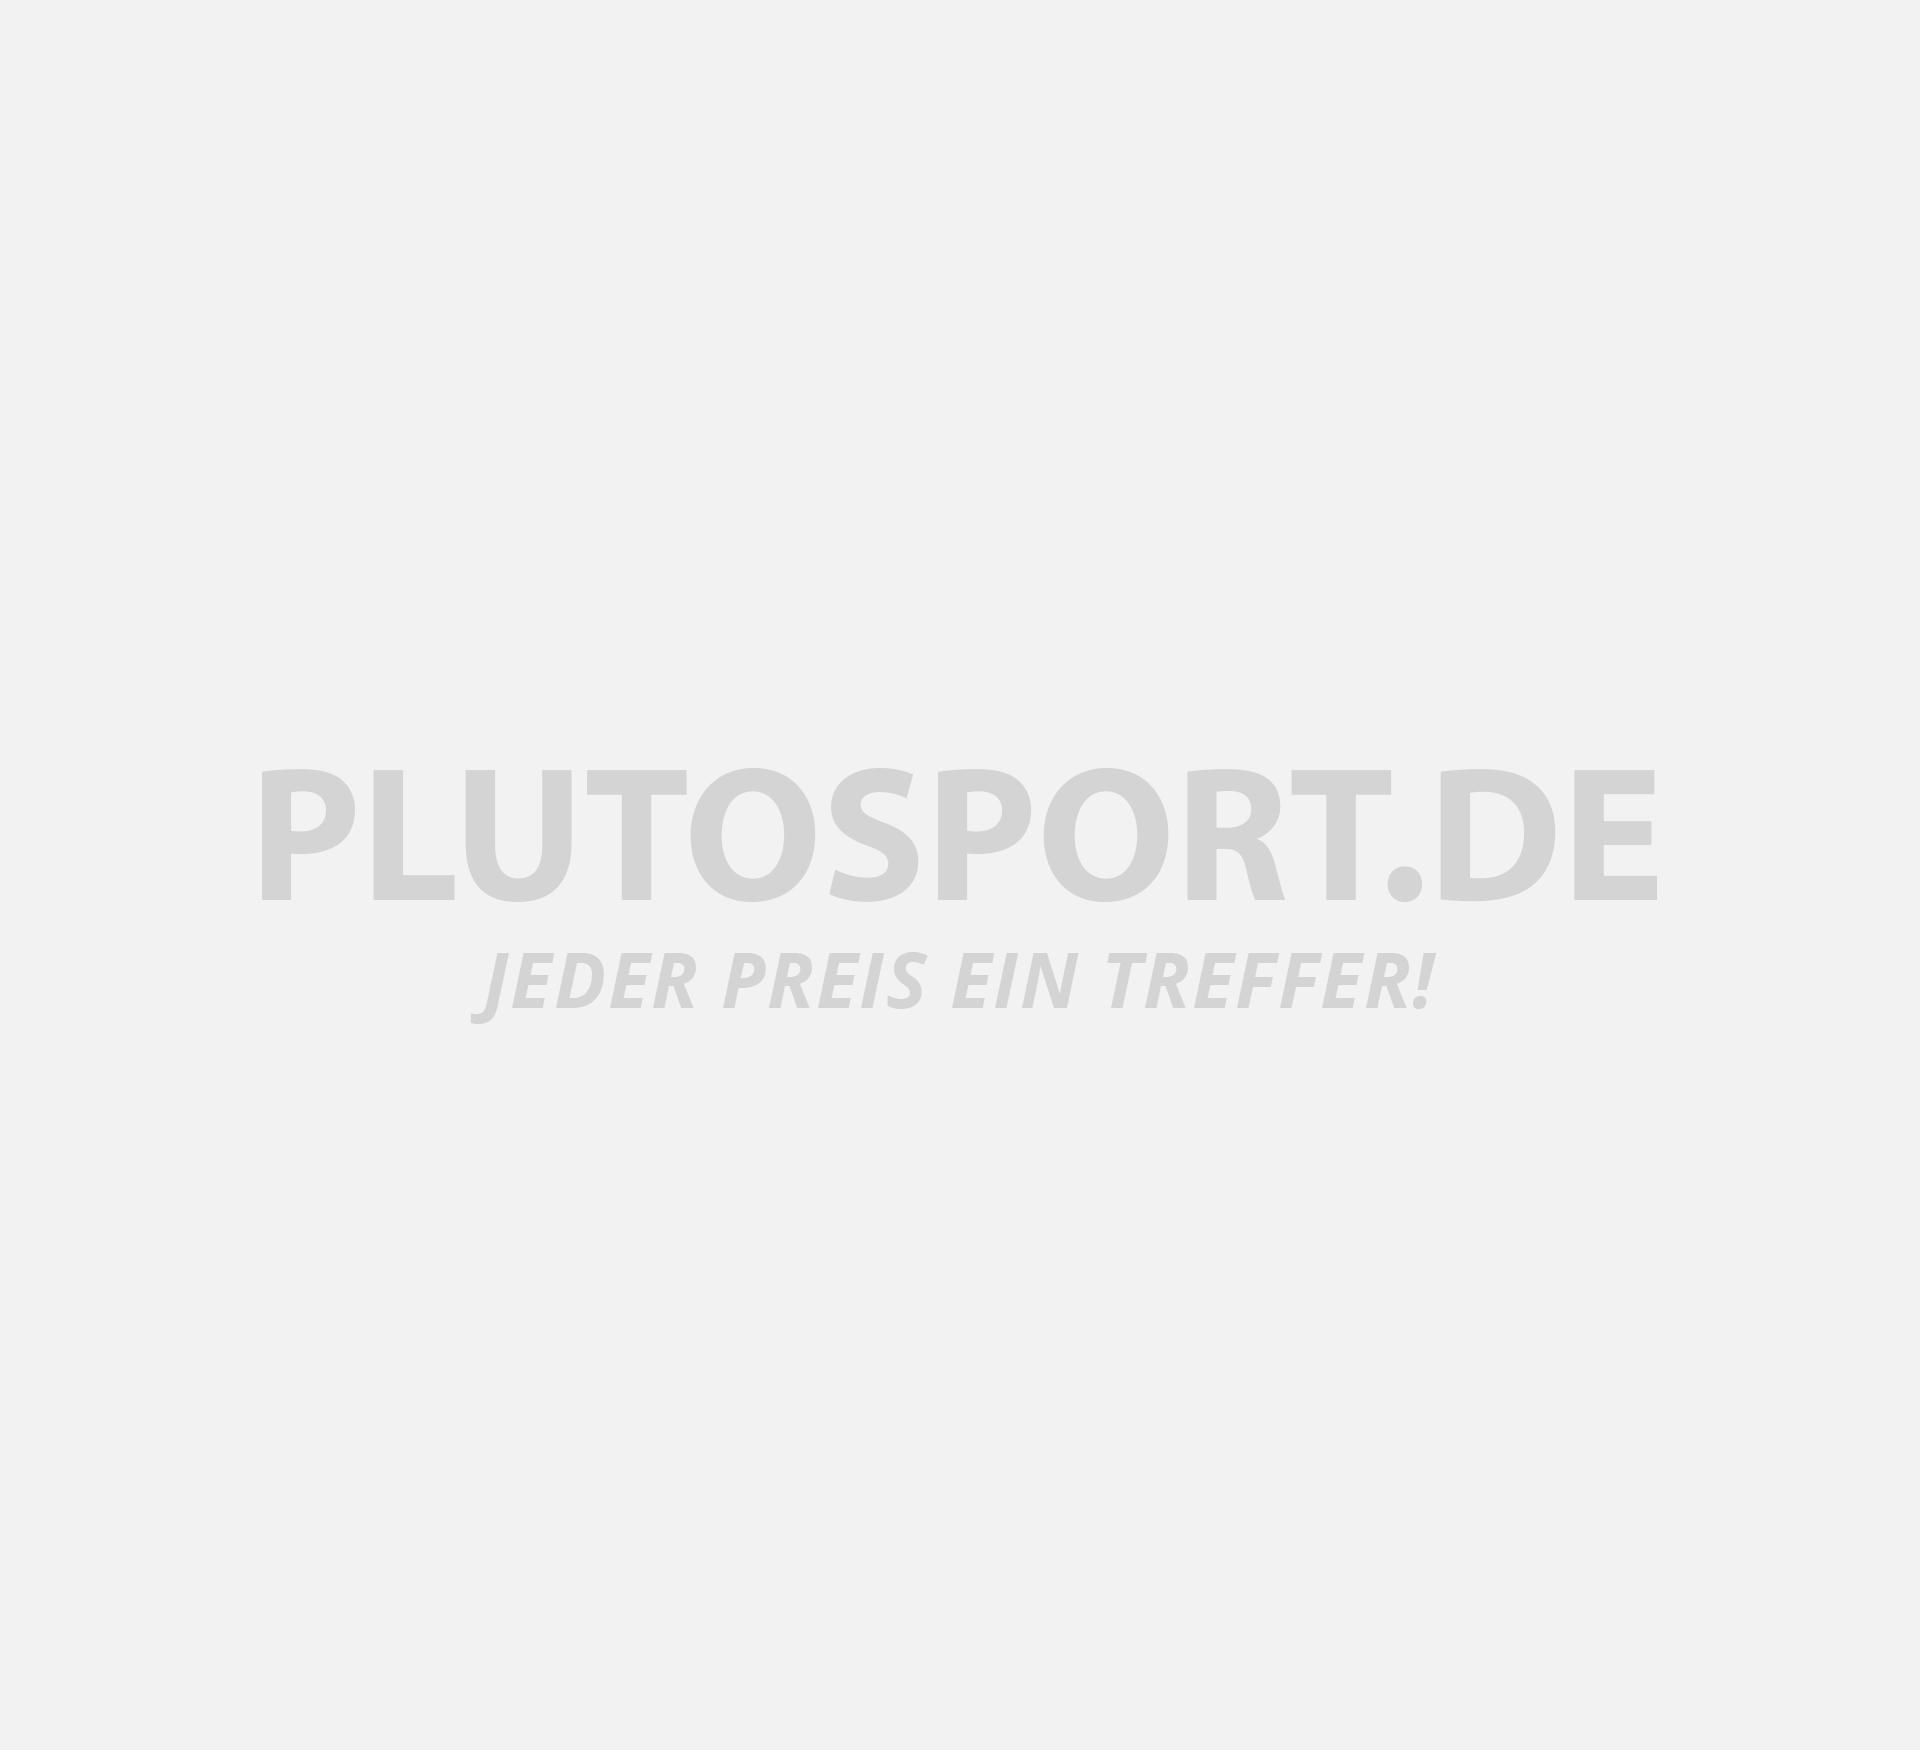 Asics Gel Cumulus 15 Laufsportschuh Damen